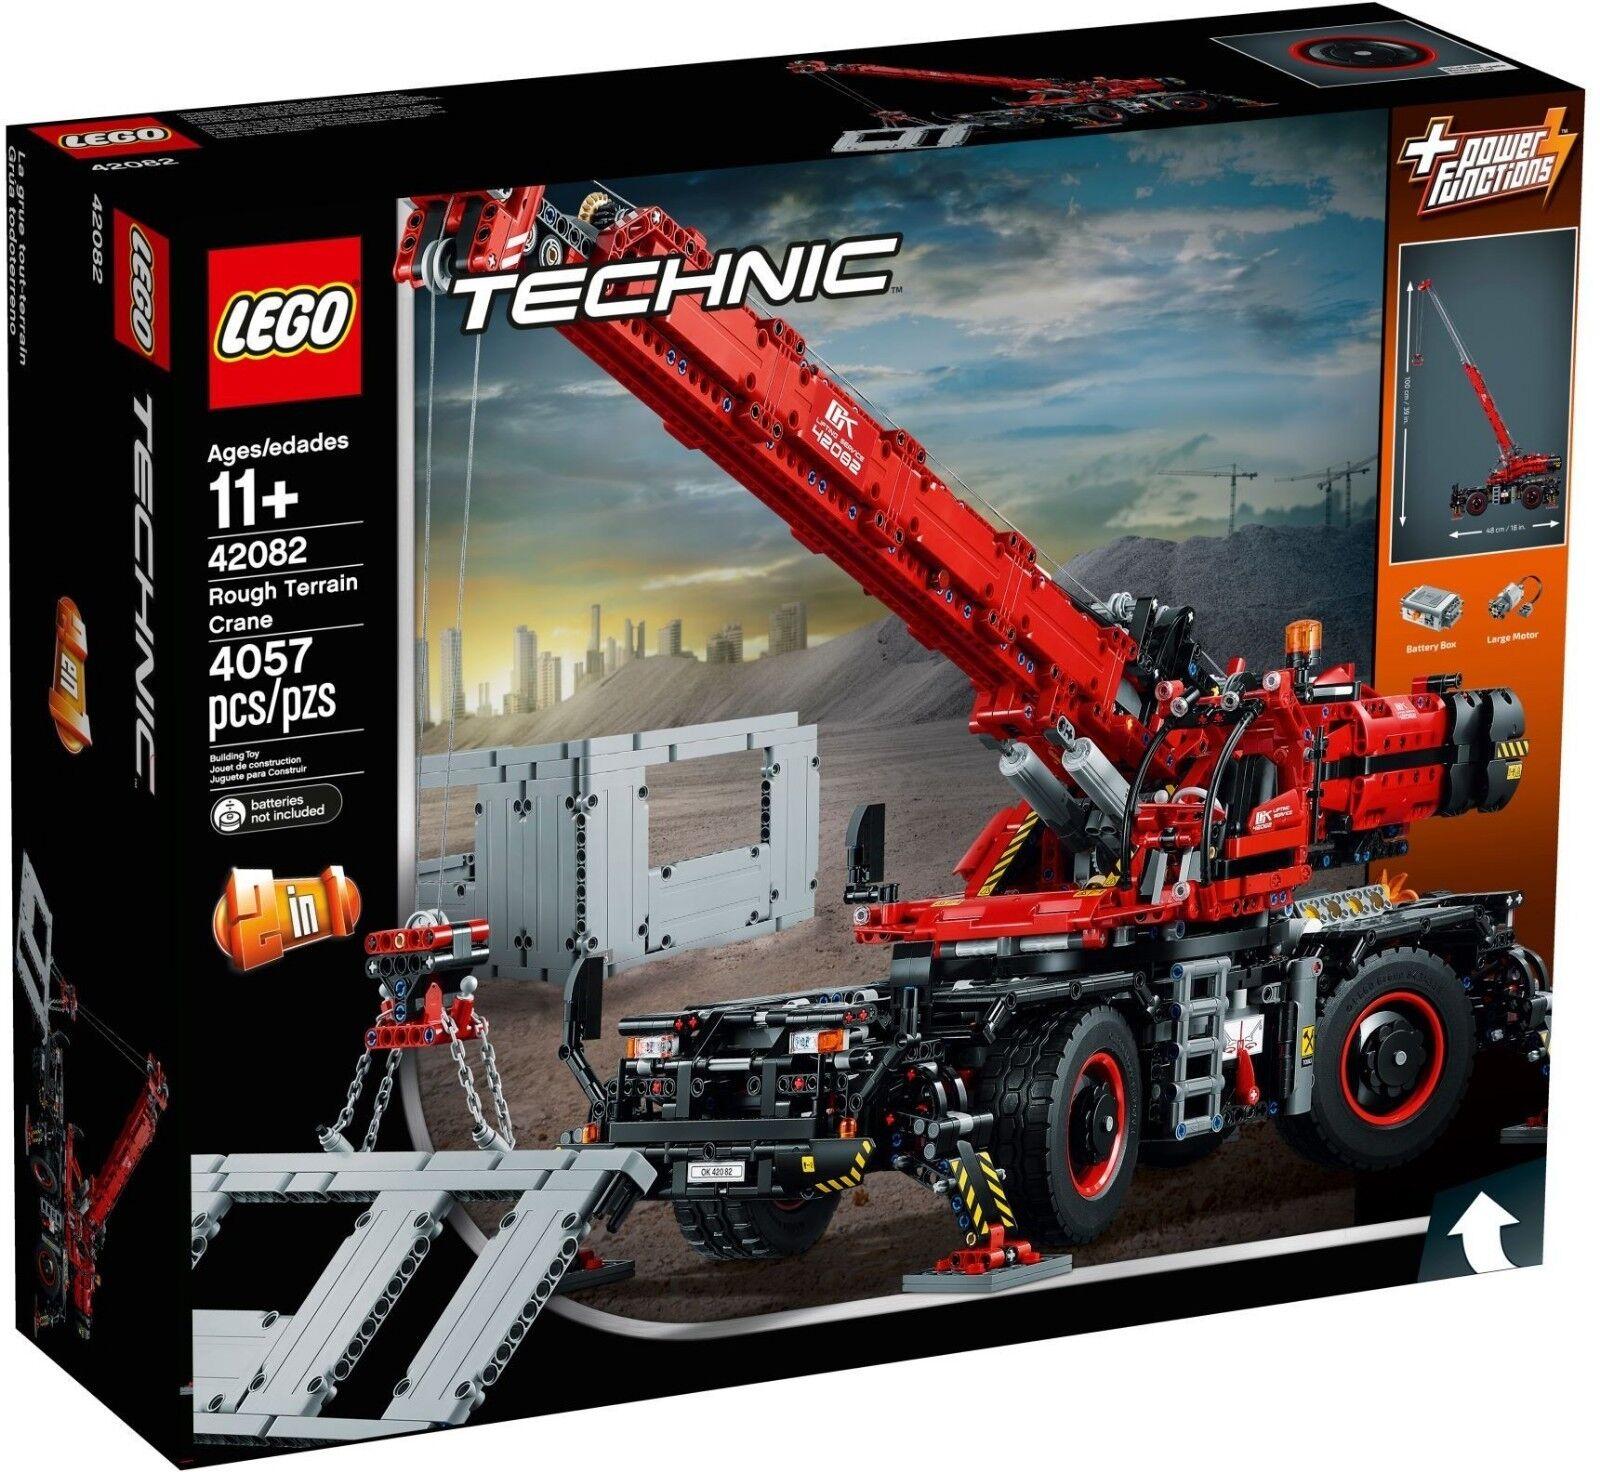 Lego Technic Technic Technic - 42082 - La grue tout-terrain - NEUF et Scellé eb8ddf